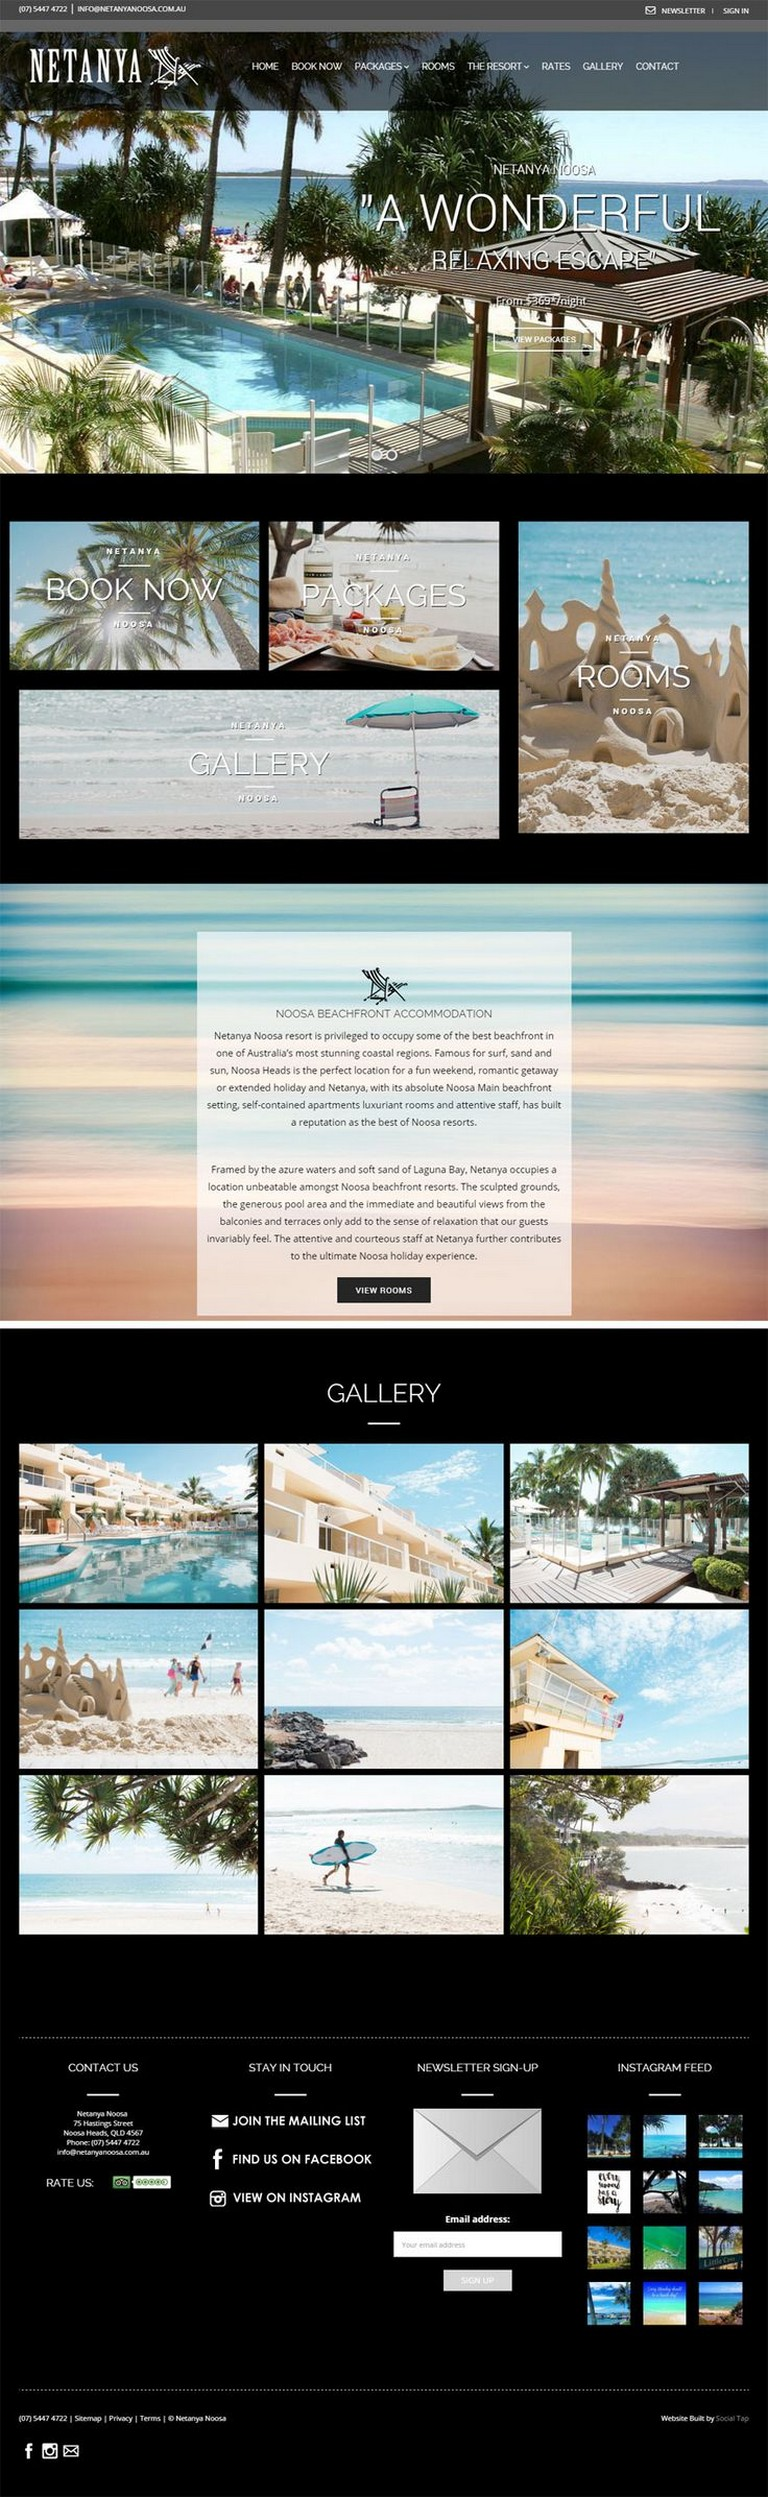 Best Tourism Websites